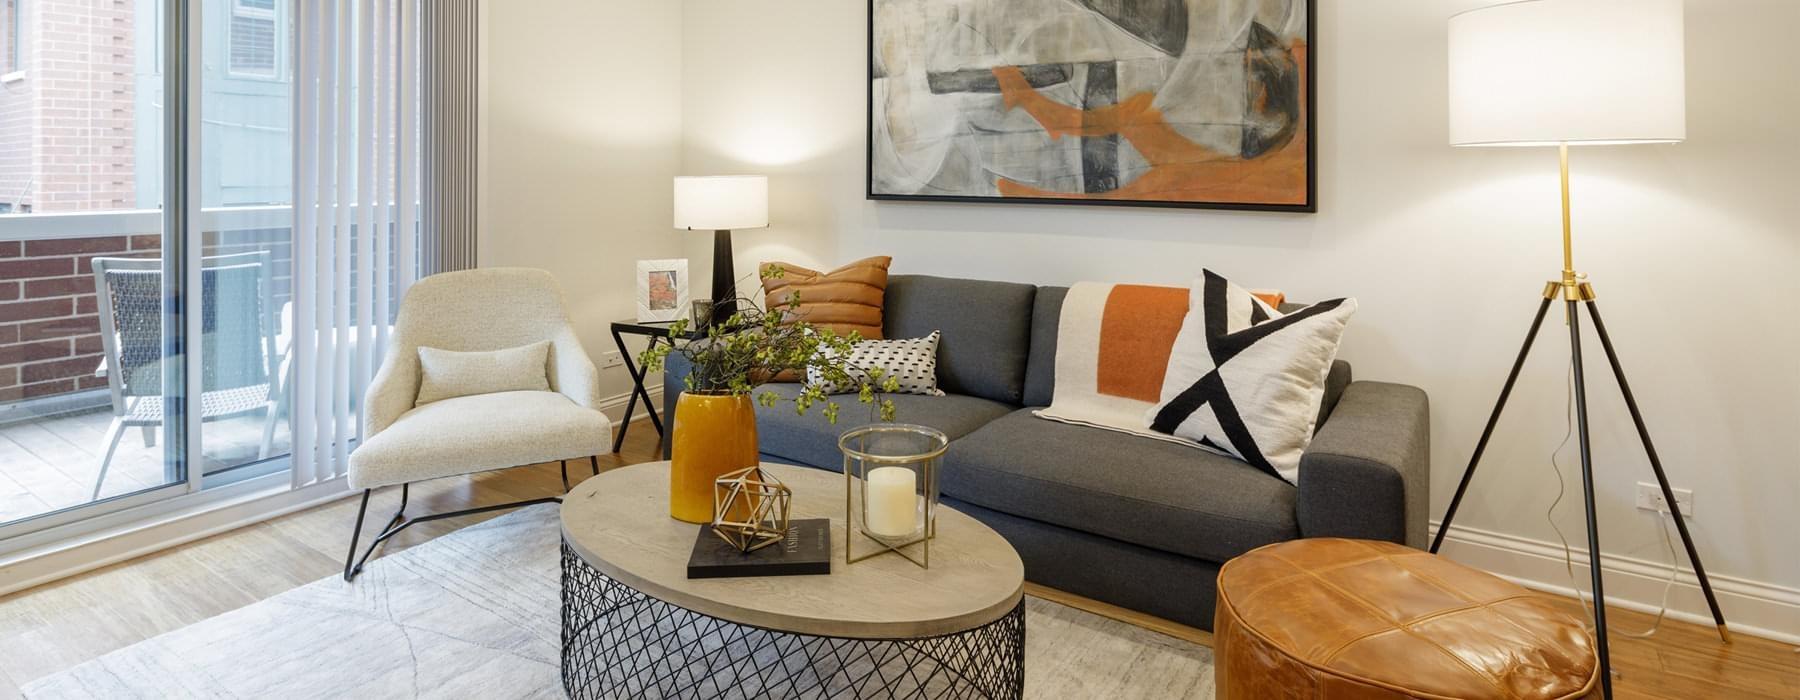 living room accesses private balcony through sliding glass door